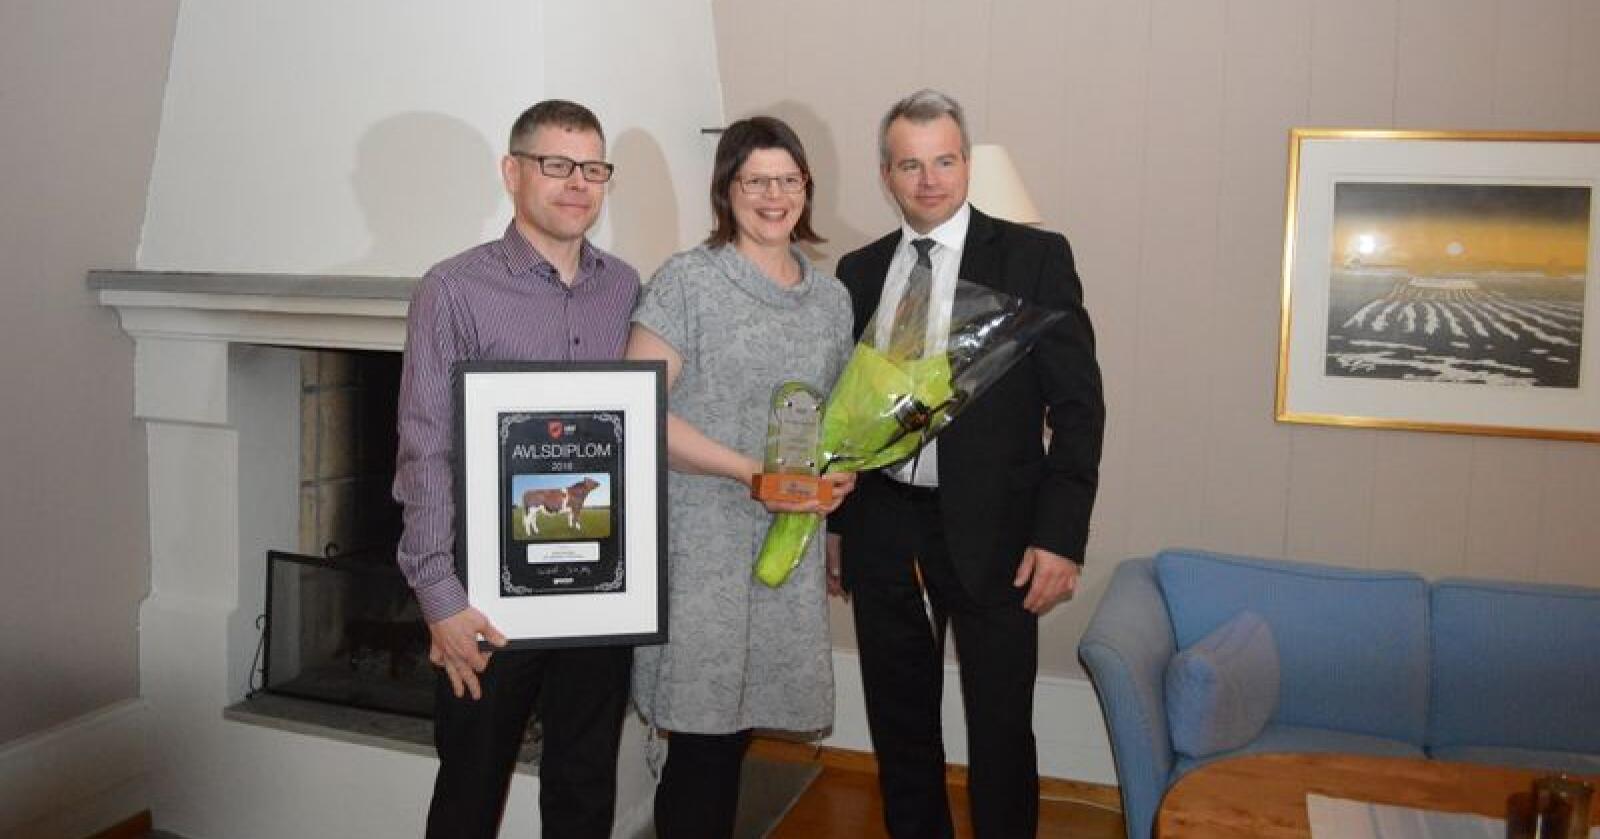 Fikk prisen under Genos årsmøte. Fra venstre: Frode Agledal, Anna Kløve og Per Heringstad, nestleder i Nortura. Foto: Eva husaas